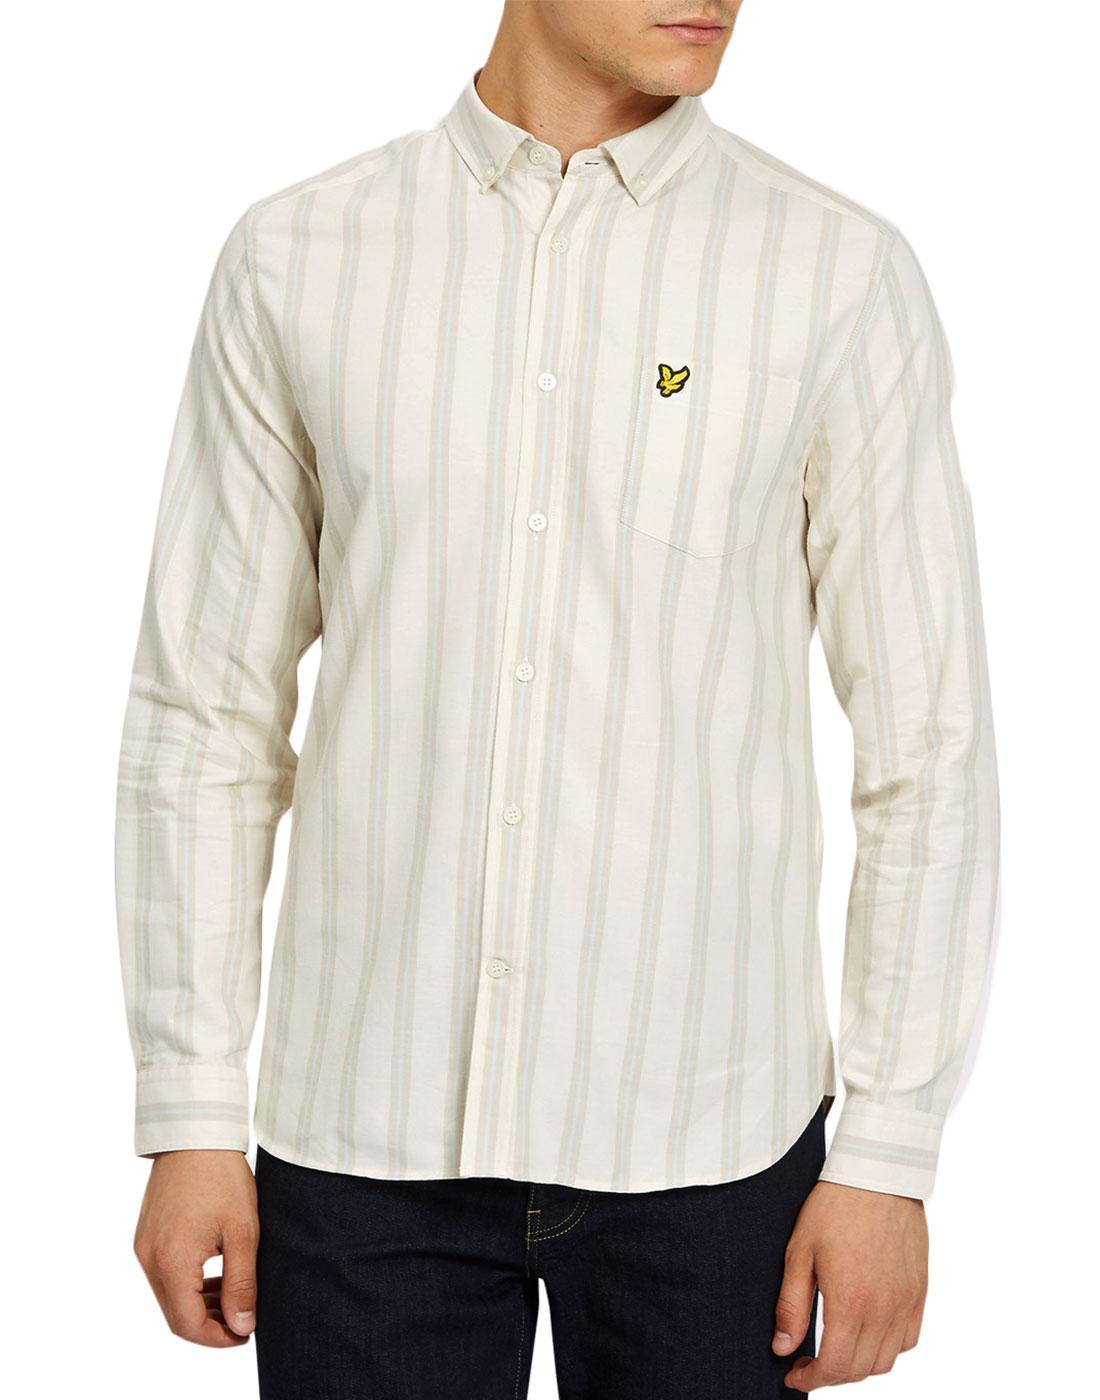 LYLE & SCOTT 60s Mod Deckchair Stripe Oxford Shirt